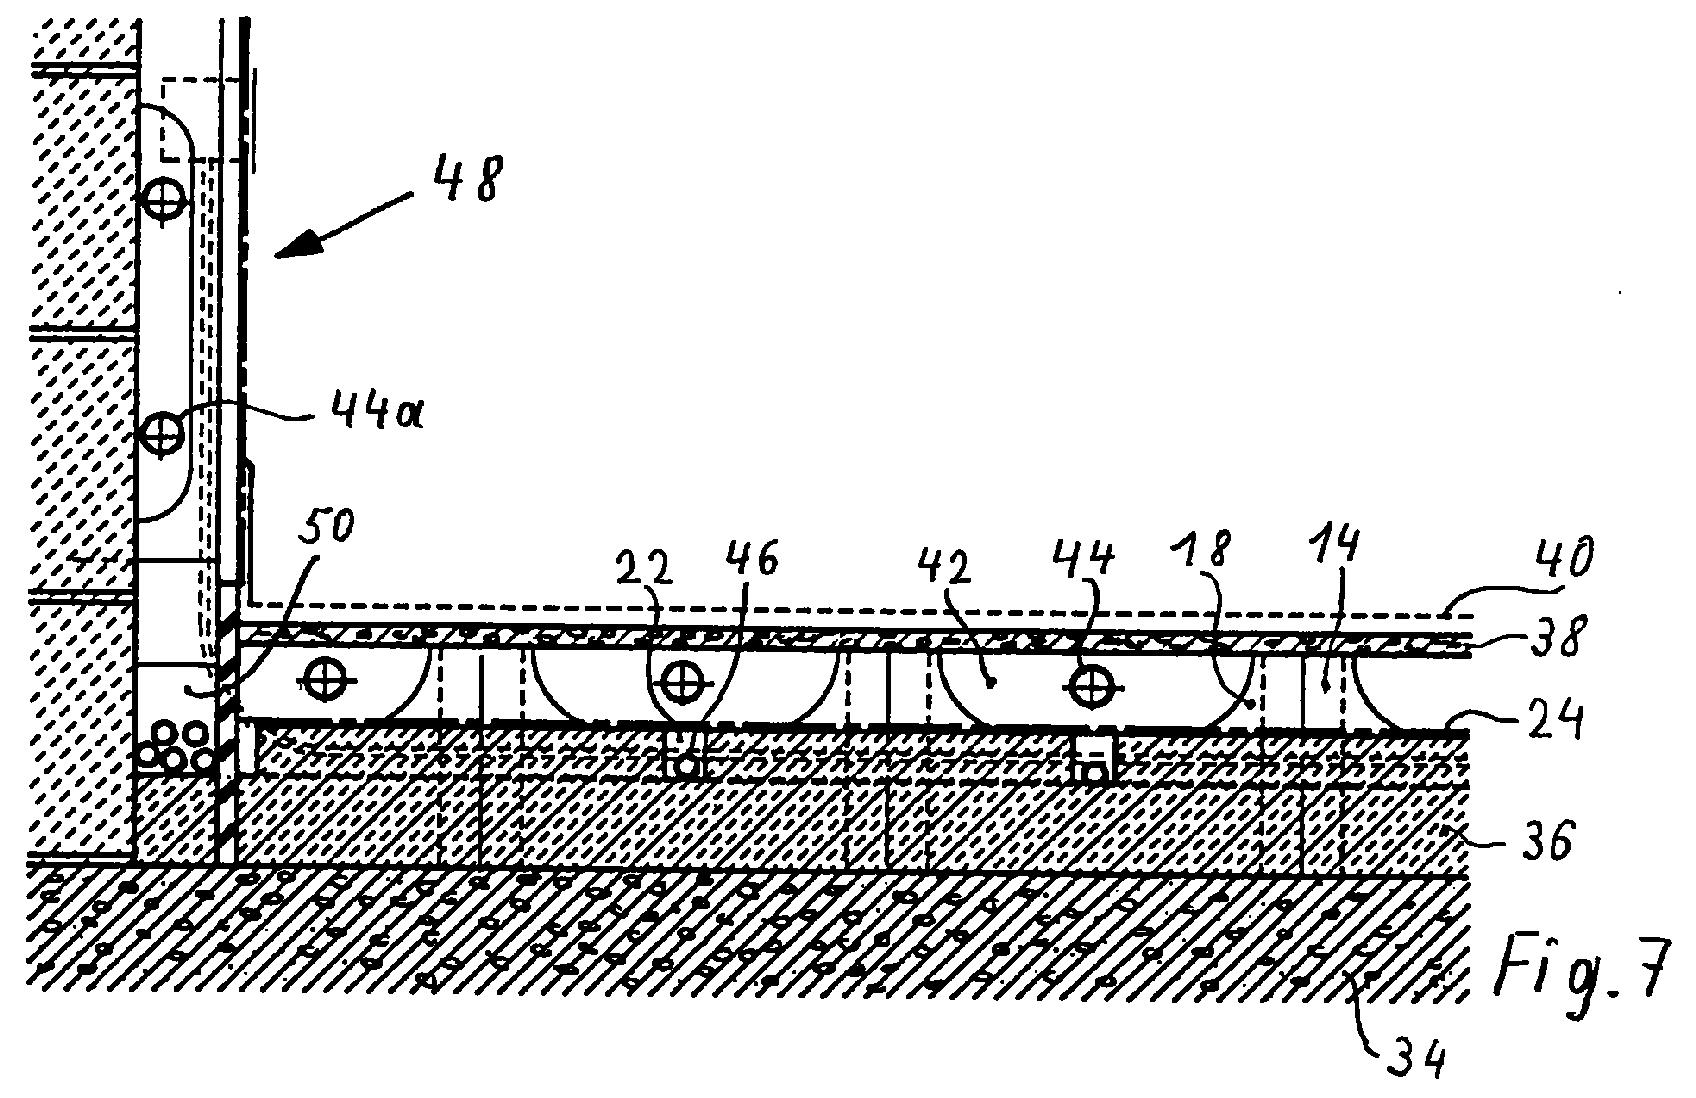 Warmedammelement Fur Bauwerke Patent 0806529